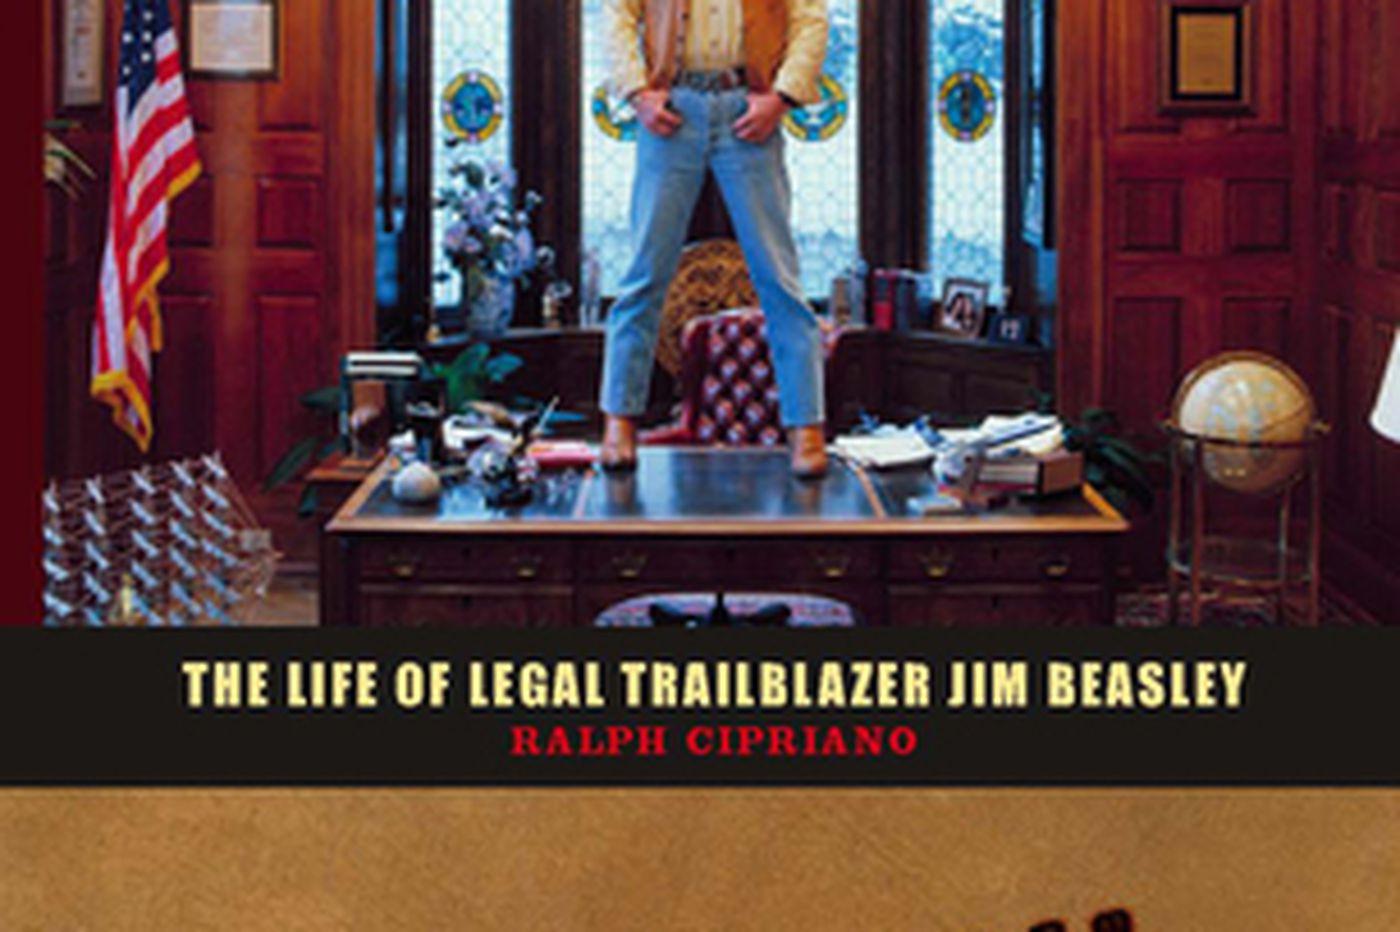 Biography of lawyer Jim Beasley falls short